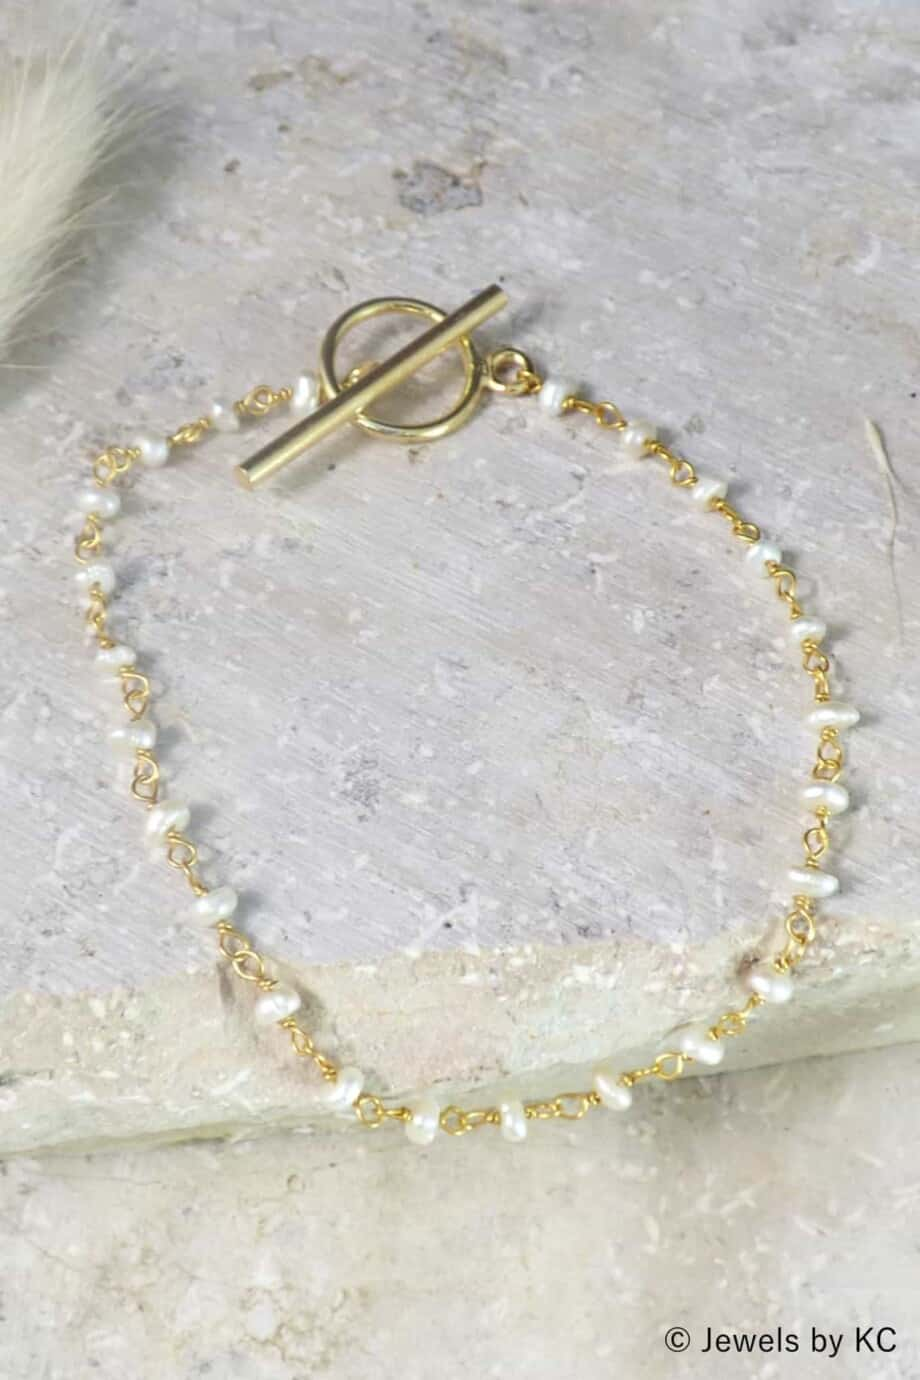 Gouden 'Rosary Pearl' armband van Goud op Zilver